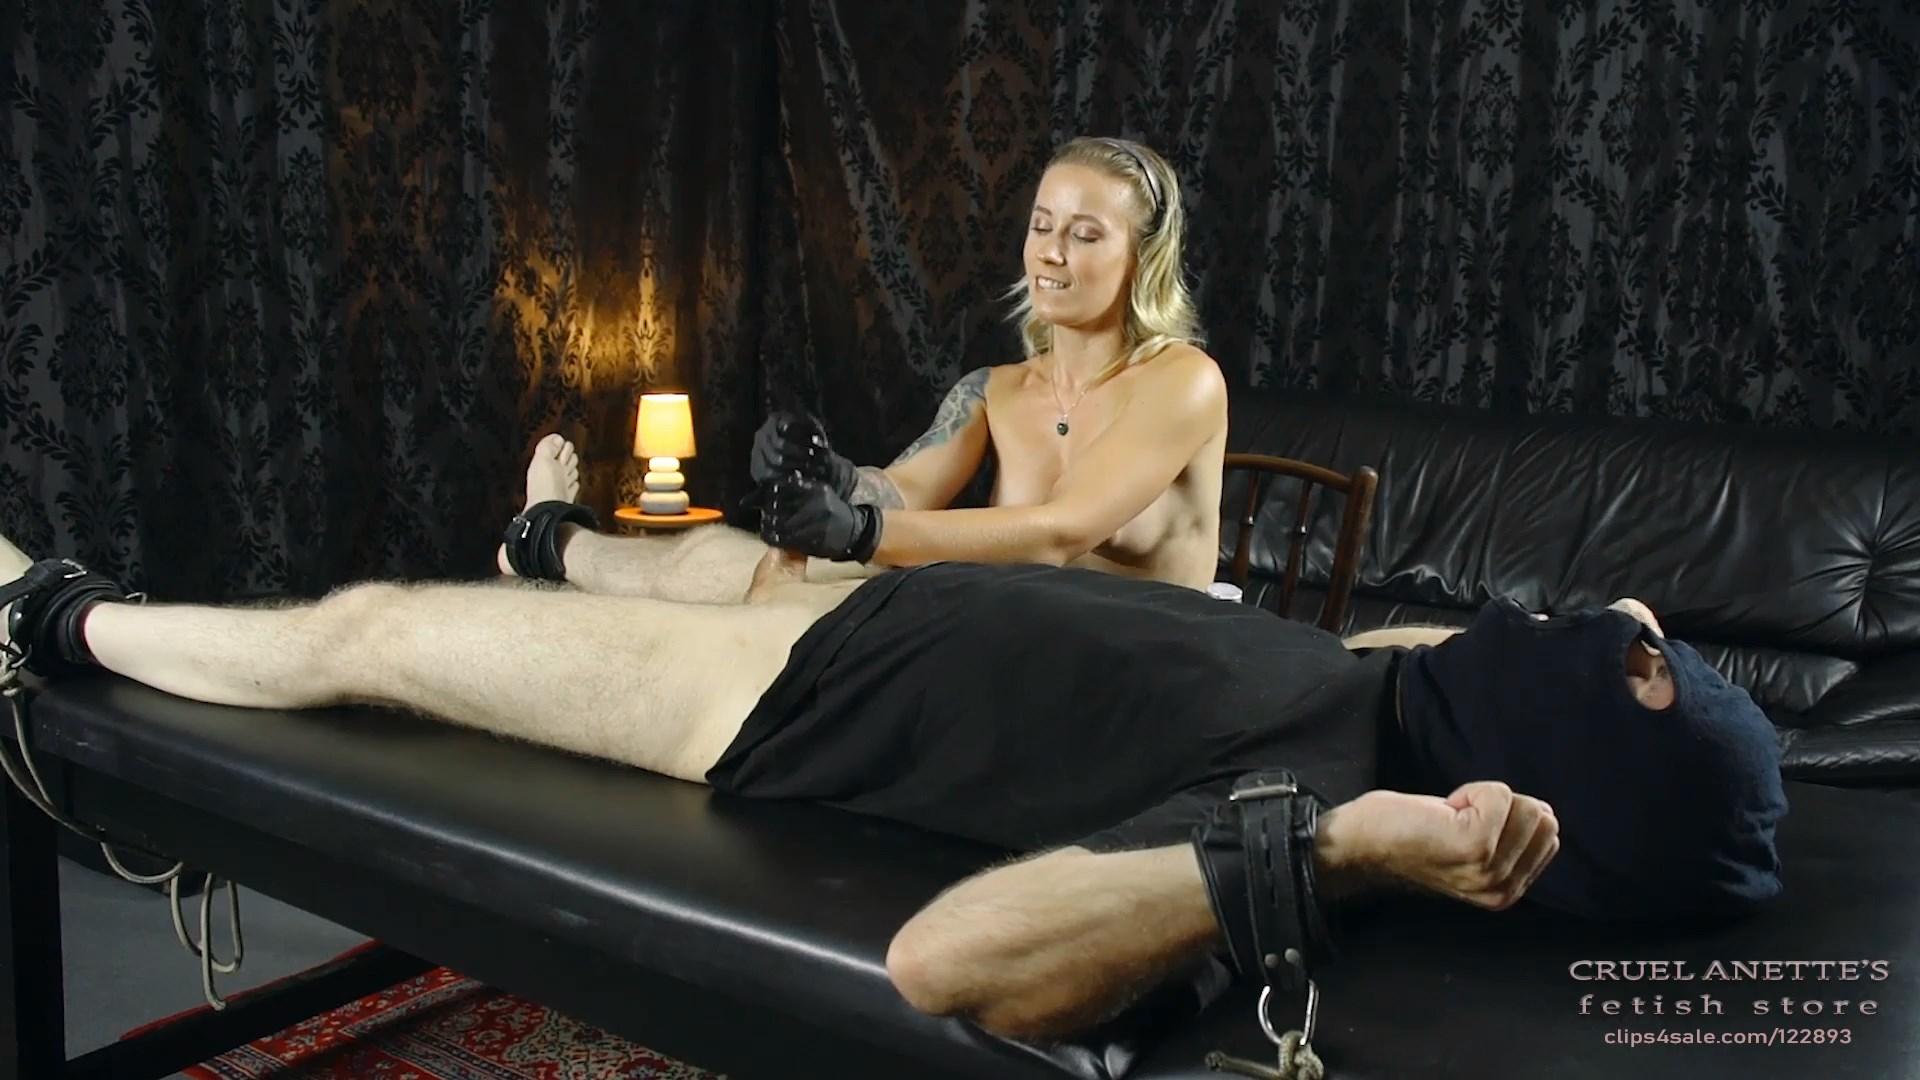 Trembling slave - CRUEL ANETTES FETISH STORE - FULL HD/1080p/MP4